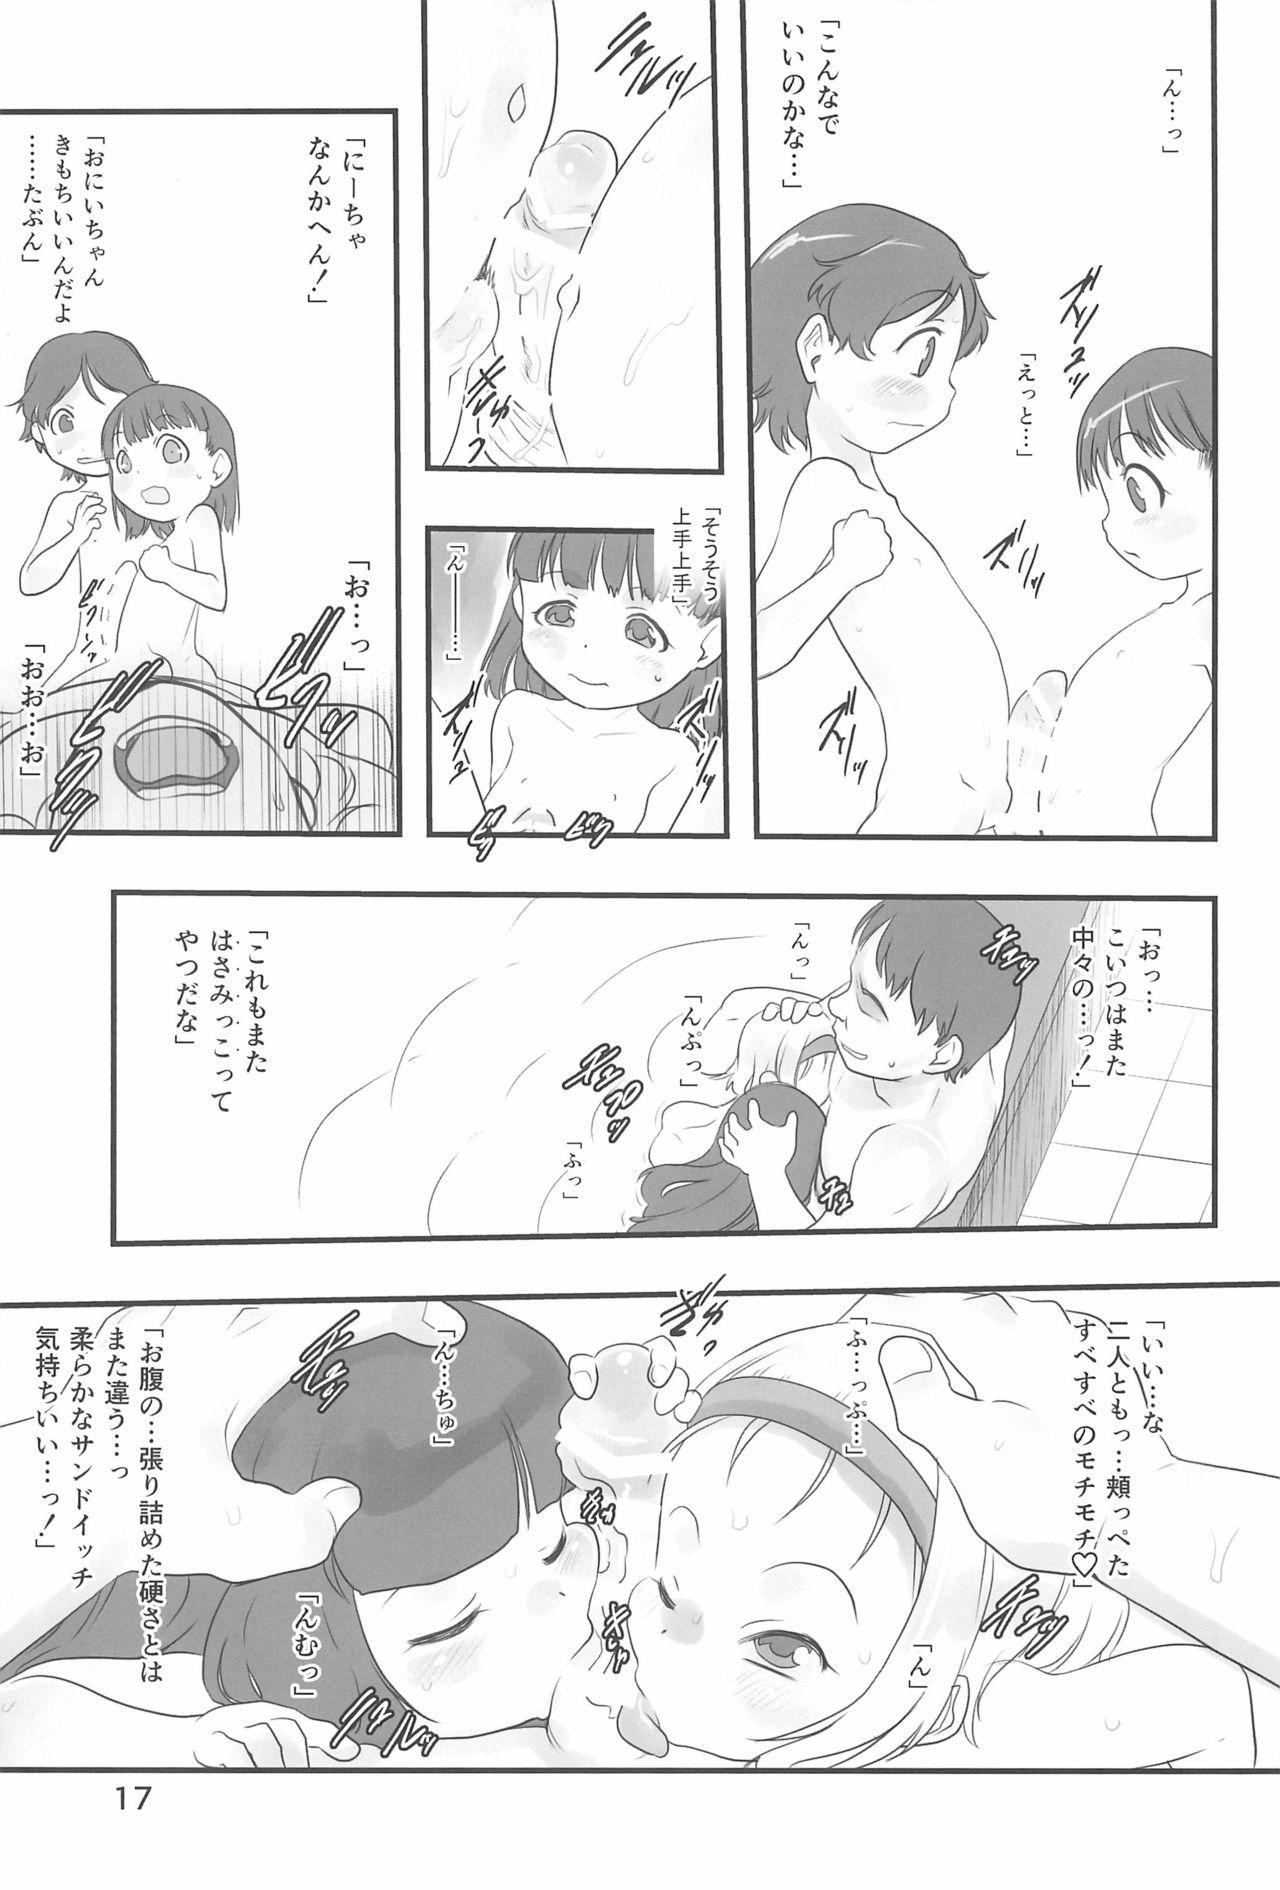 Hasamikko. Ichiban Sentou 16